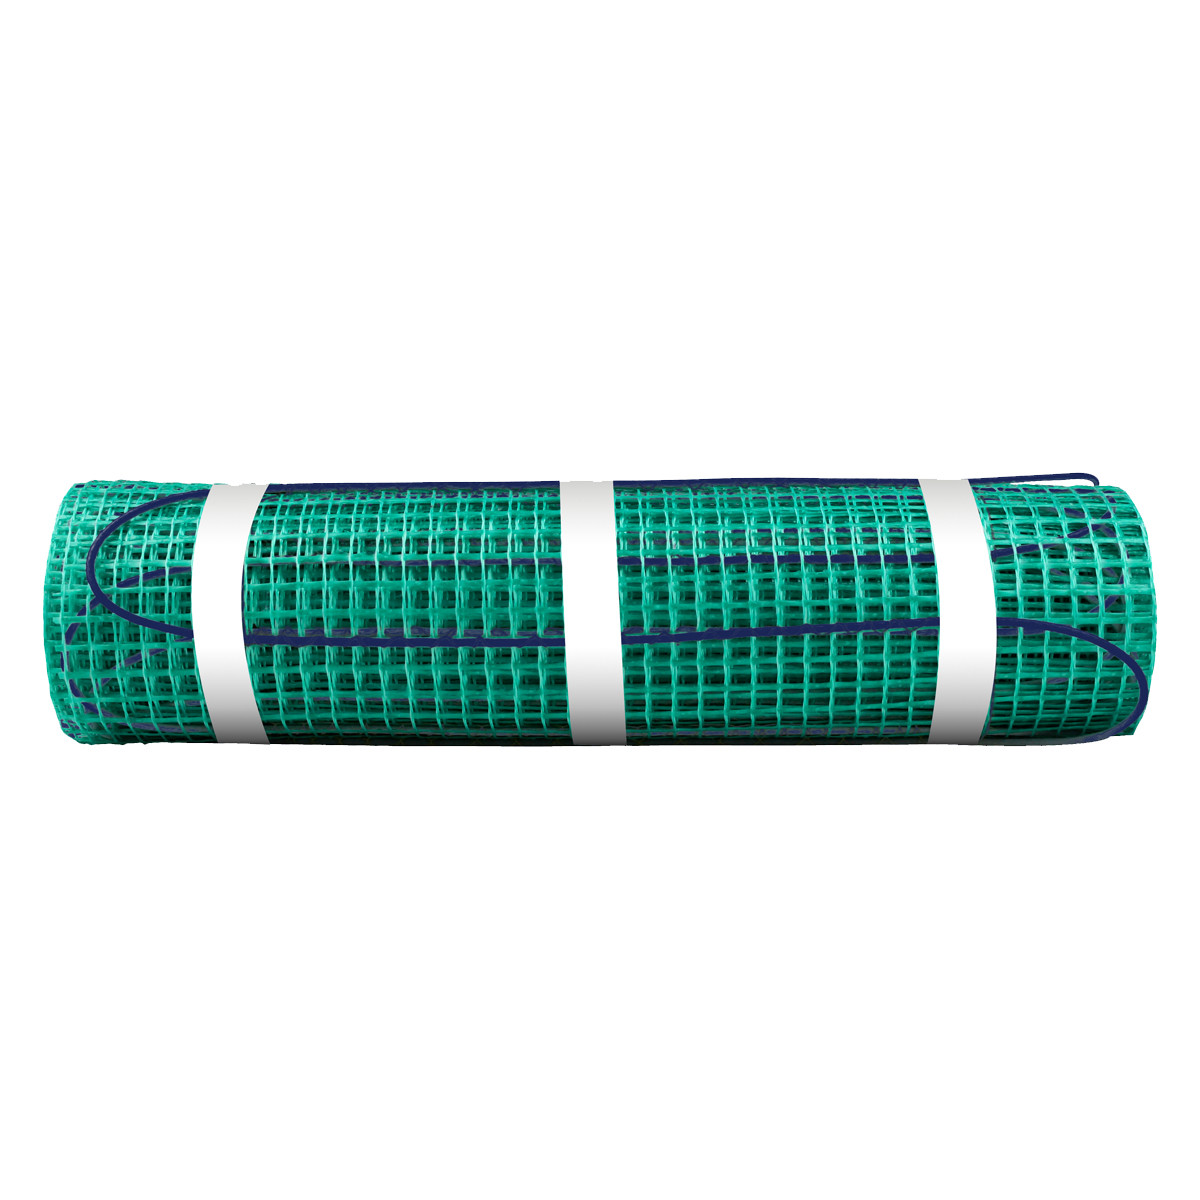 WarmlyYours TRT240-1.5x14 TempZone 240V 1.4A 1.5 Foot x 14 Foot Flex Roll